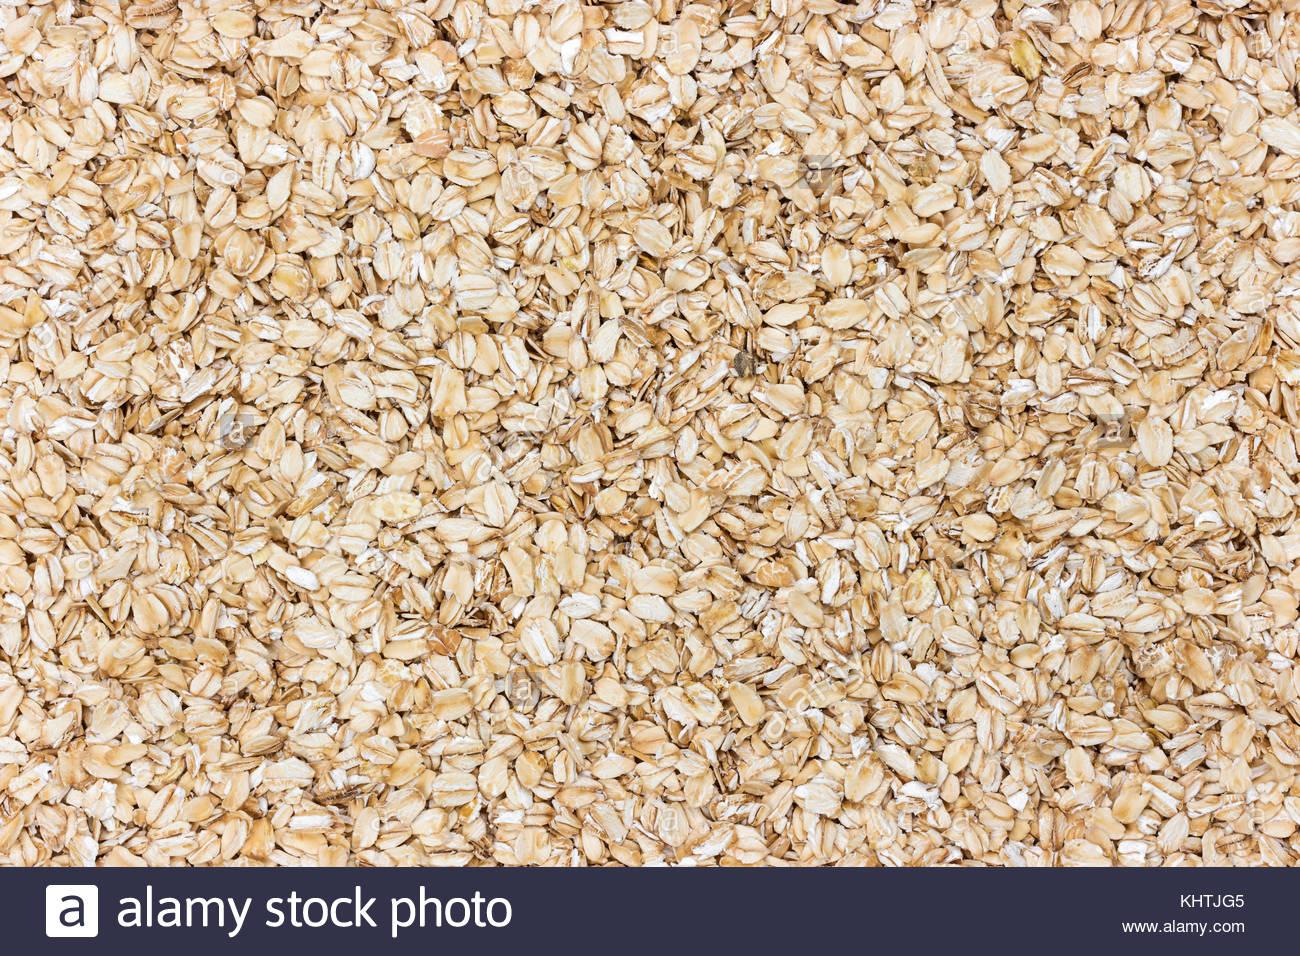 Oatmeal background Oat flakes texture Stock Photo 165883877   Alamy 1300x956